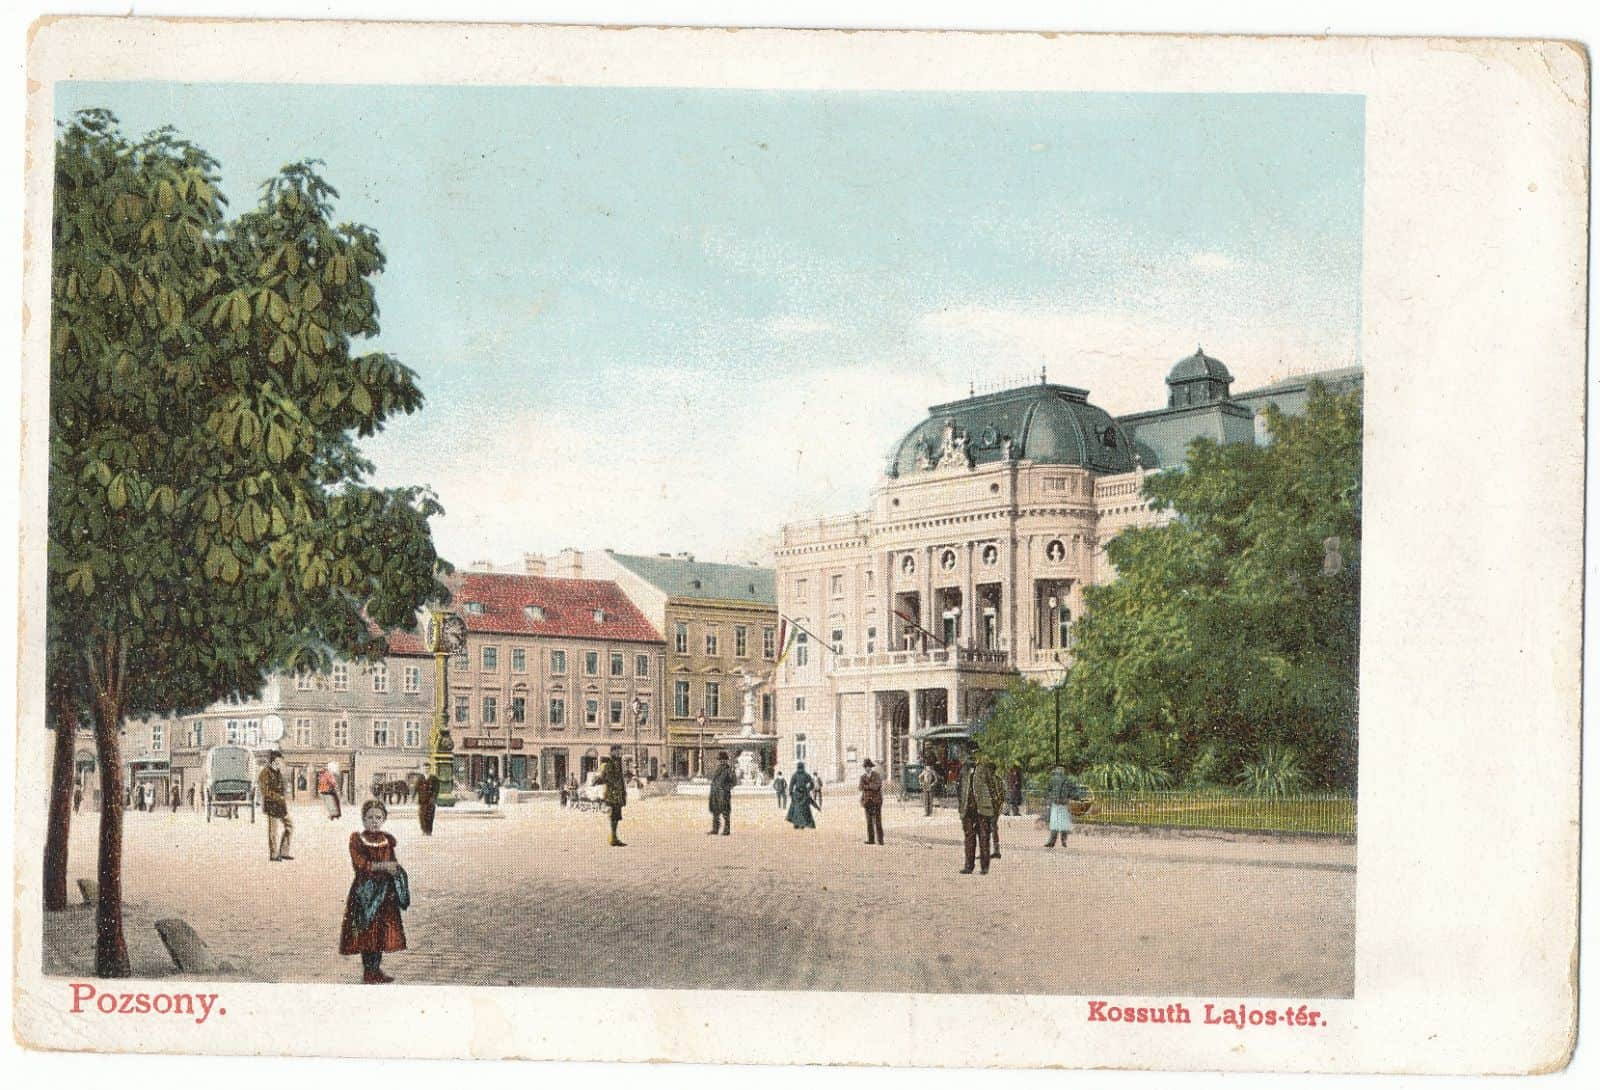 Autor: 1905, Bratislava historické fotografie / Kronika Slovenskej republiky